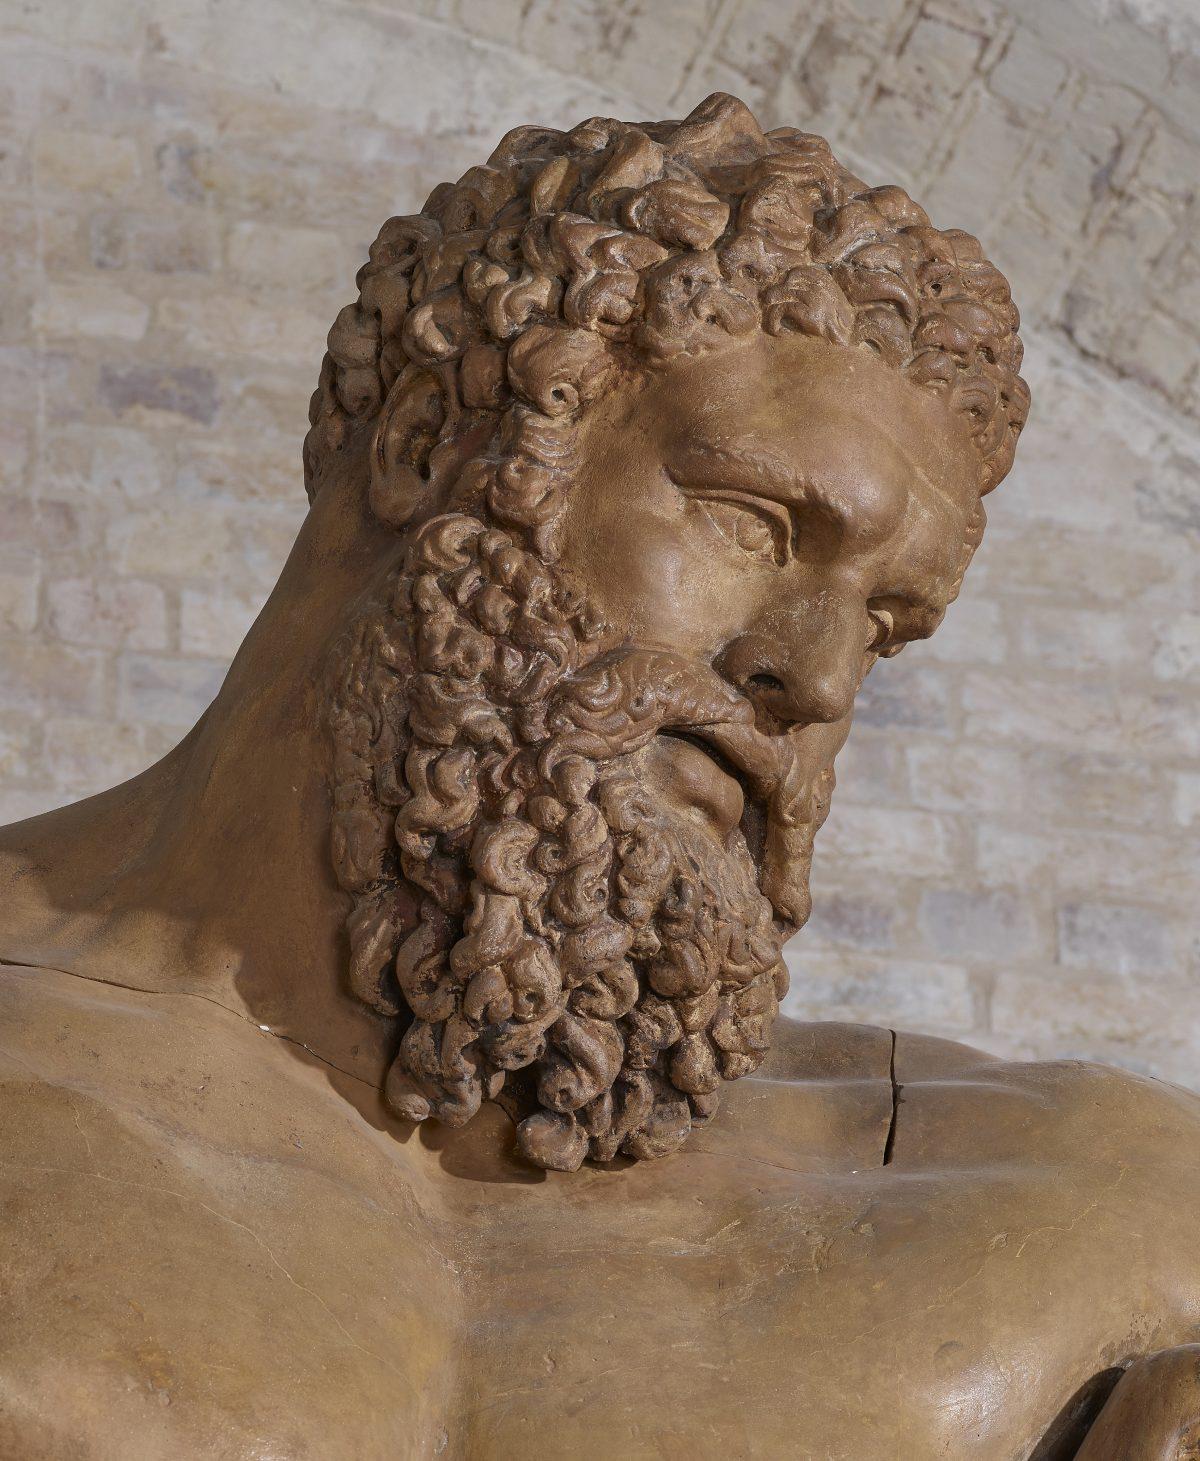 plaster cast head of classical statute Farnese Hercules